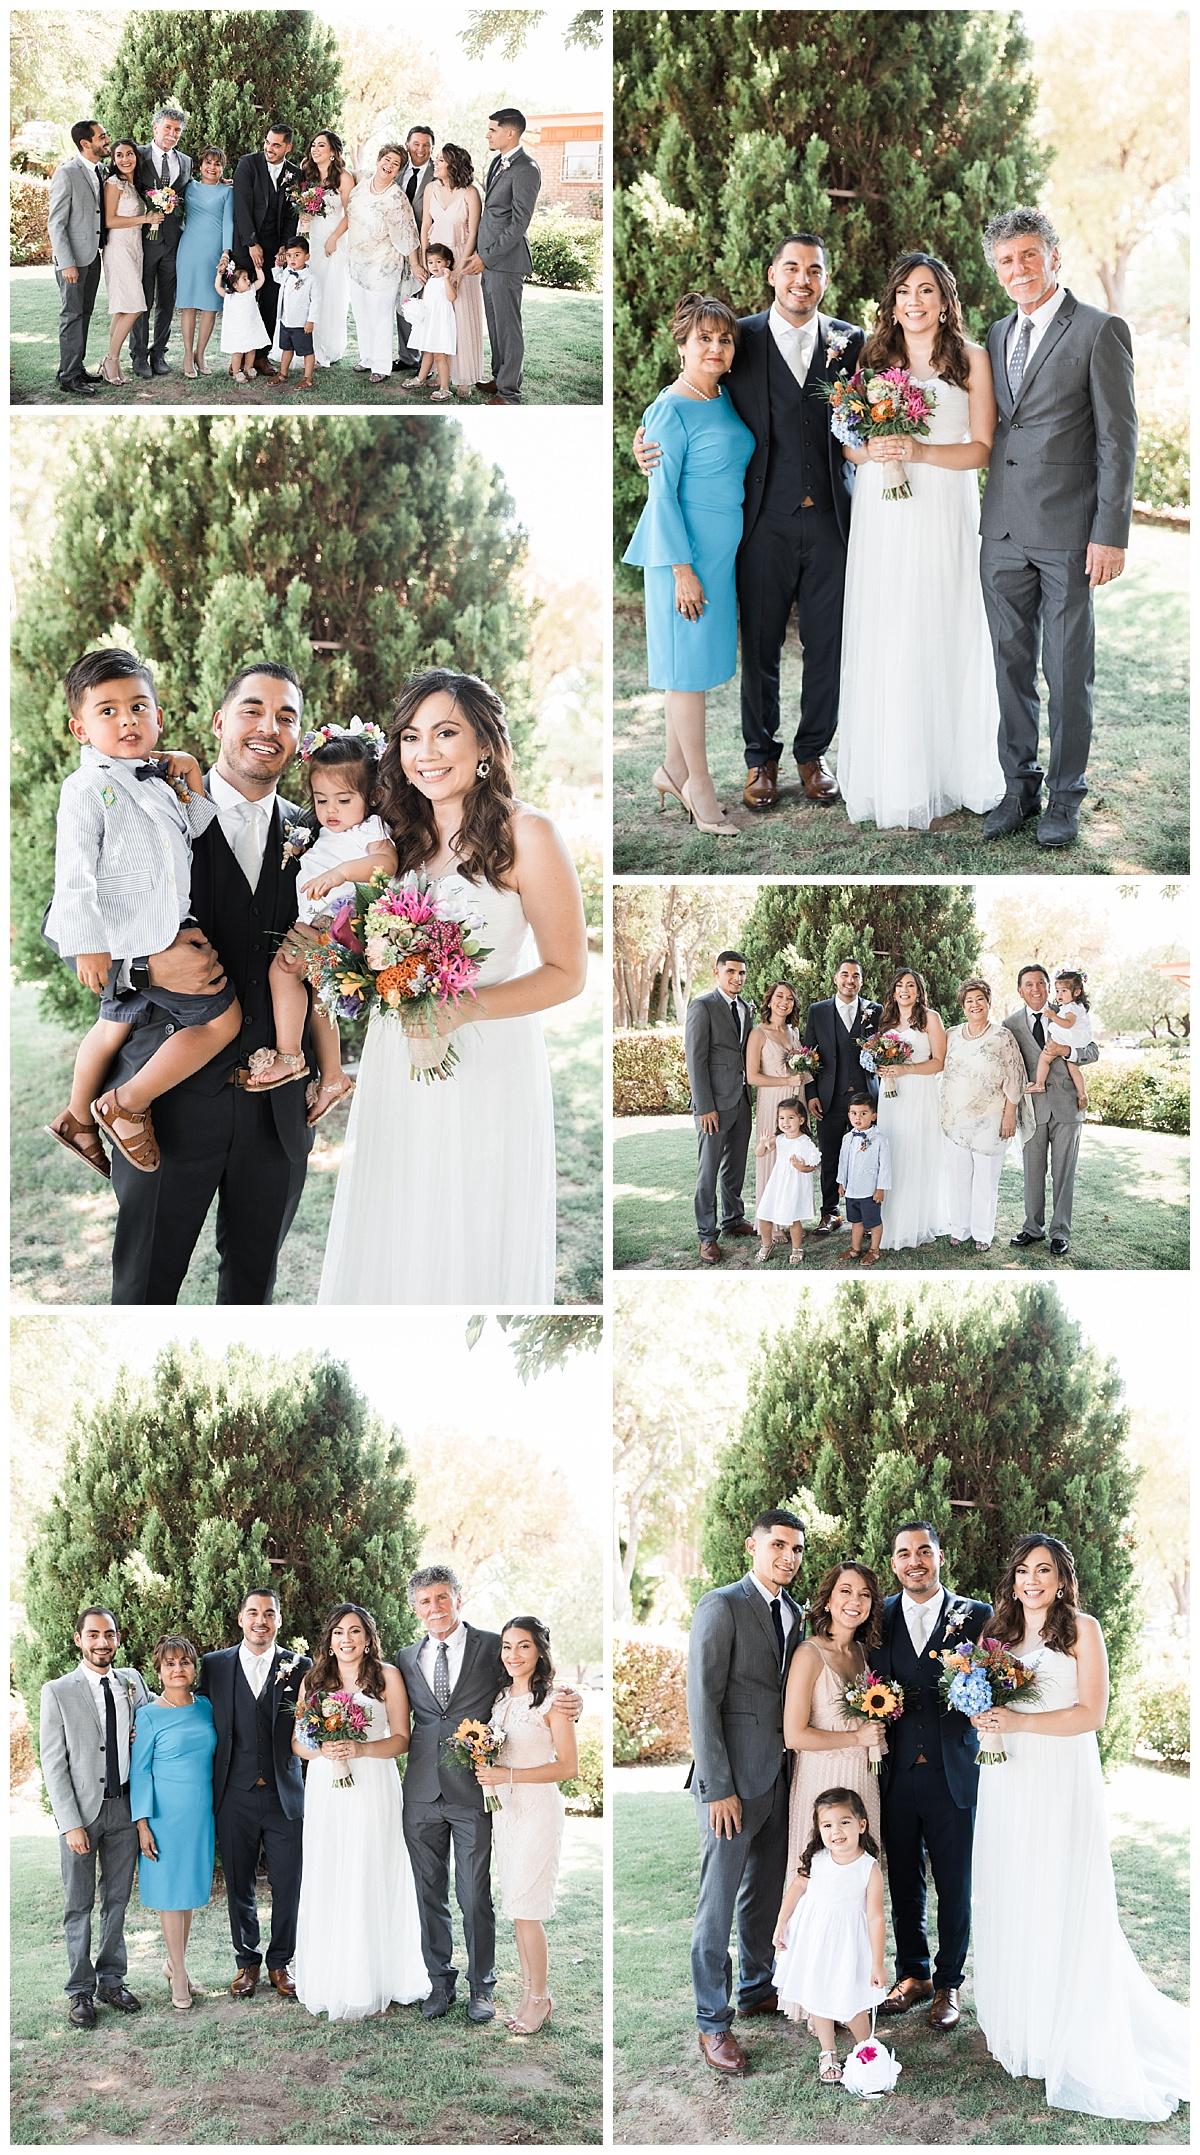 el paso wedding photographer, country club